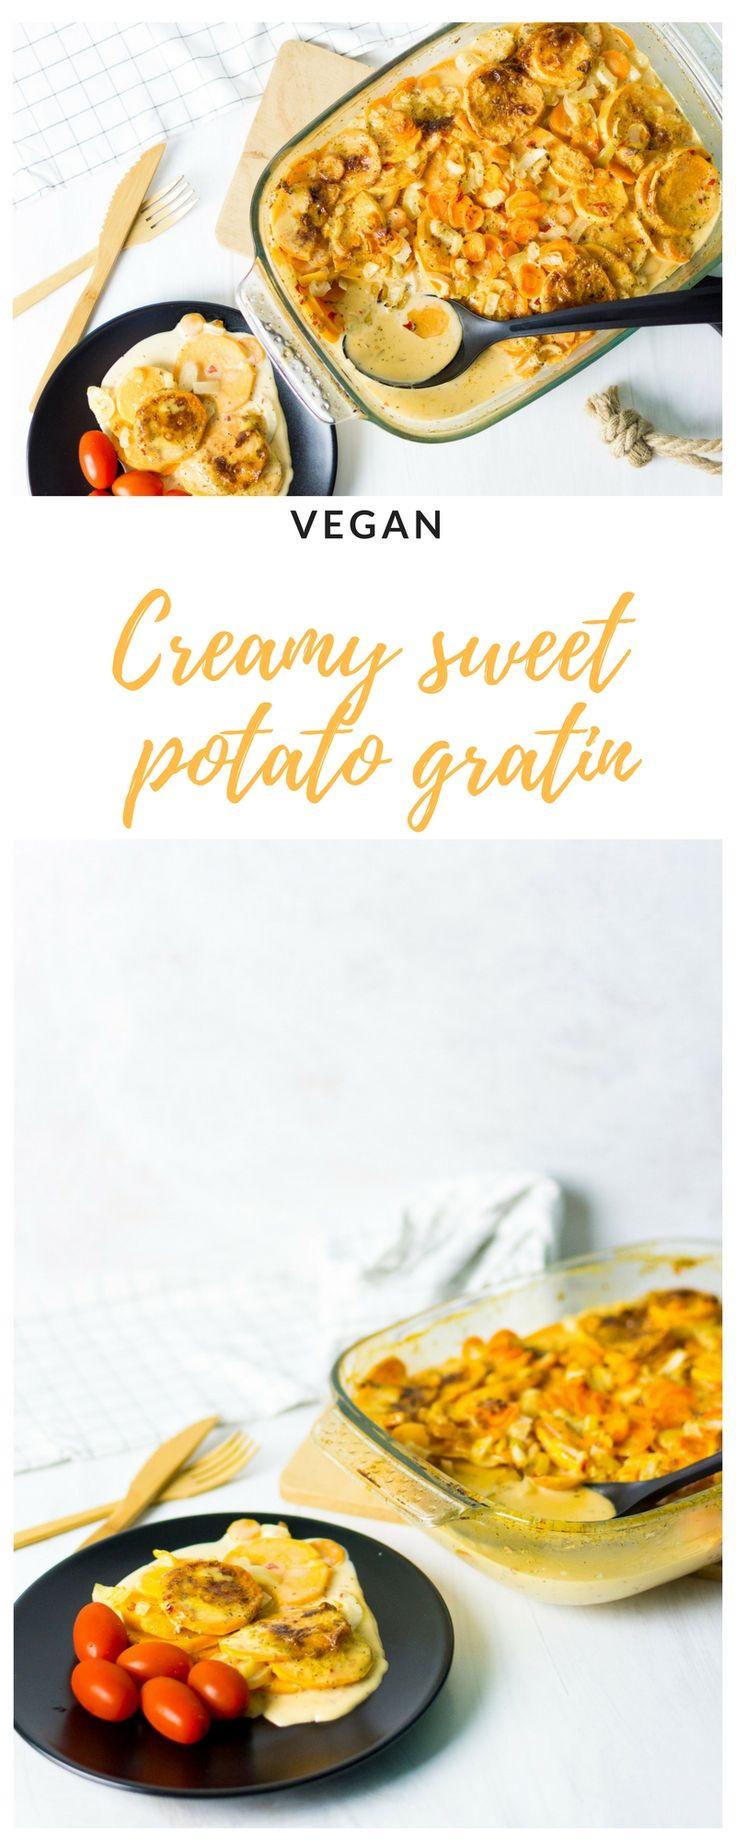 Creamy sweet potato gratin. Vegan dinner.